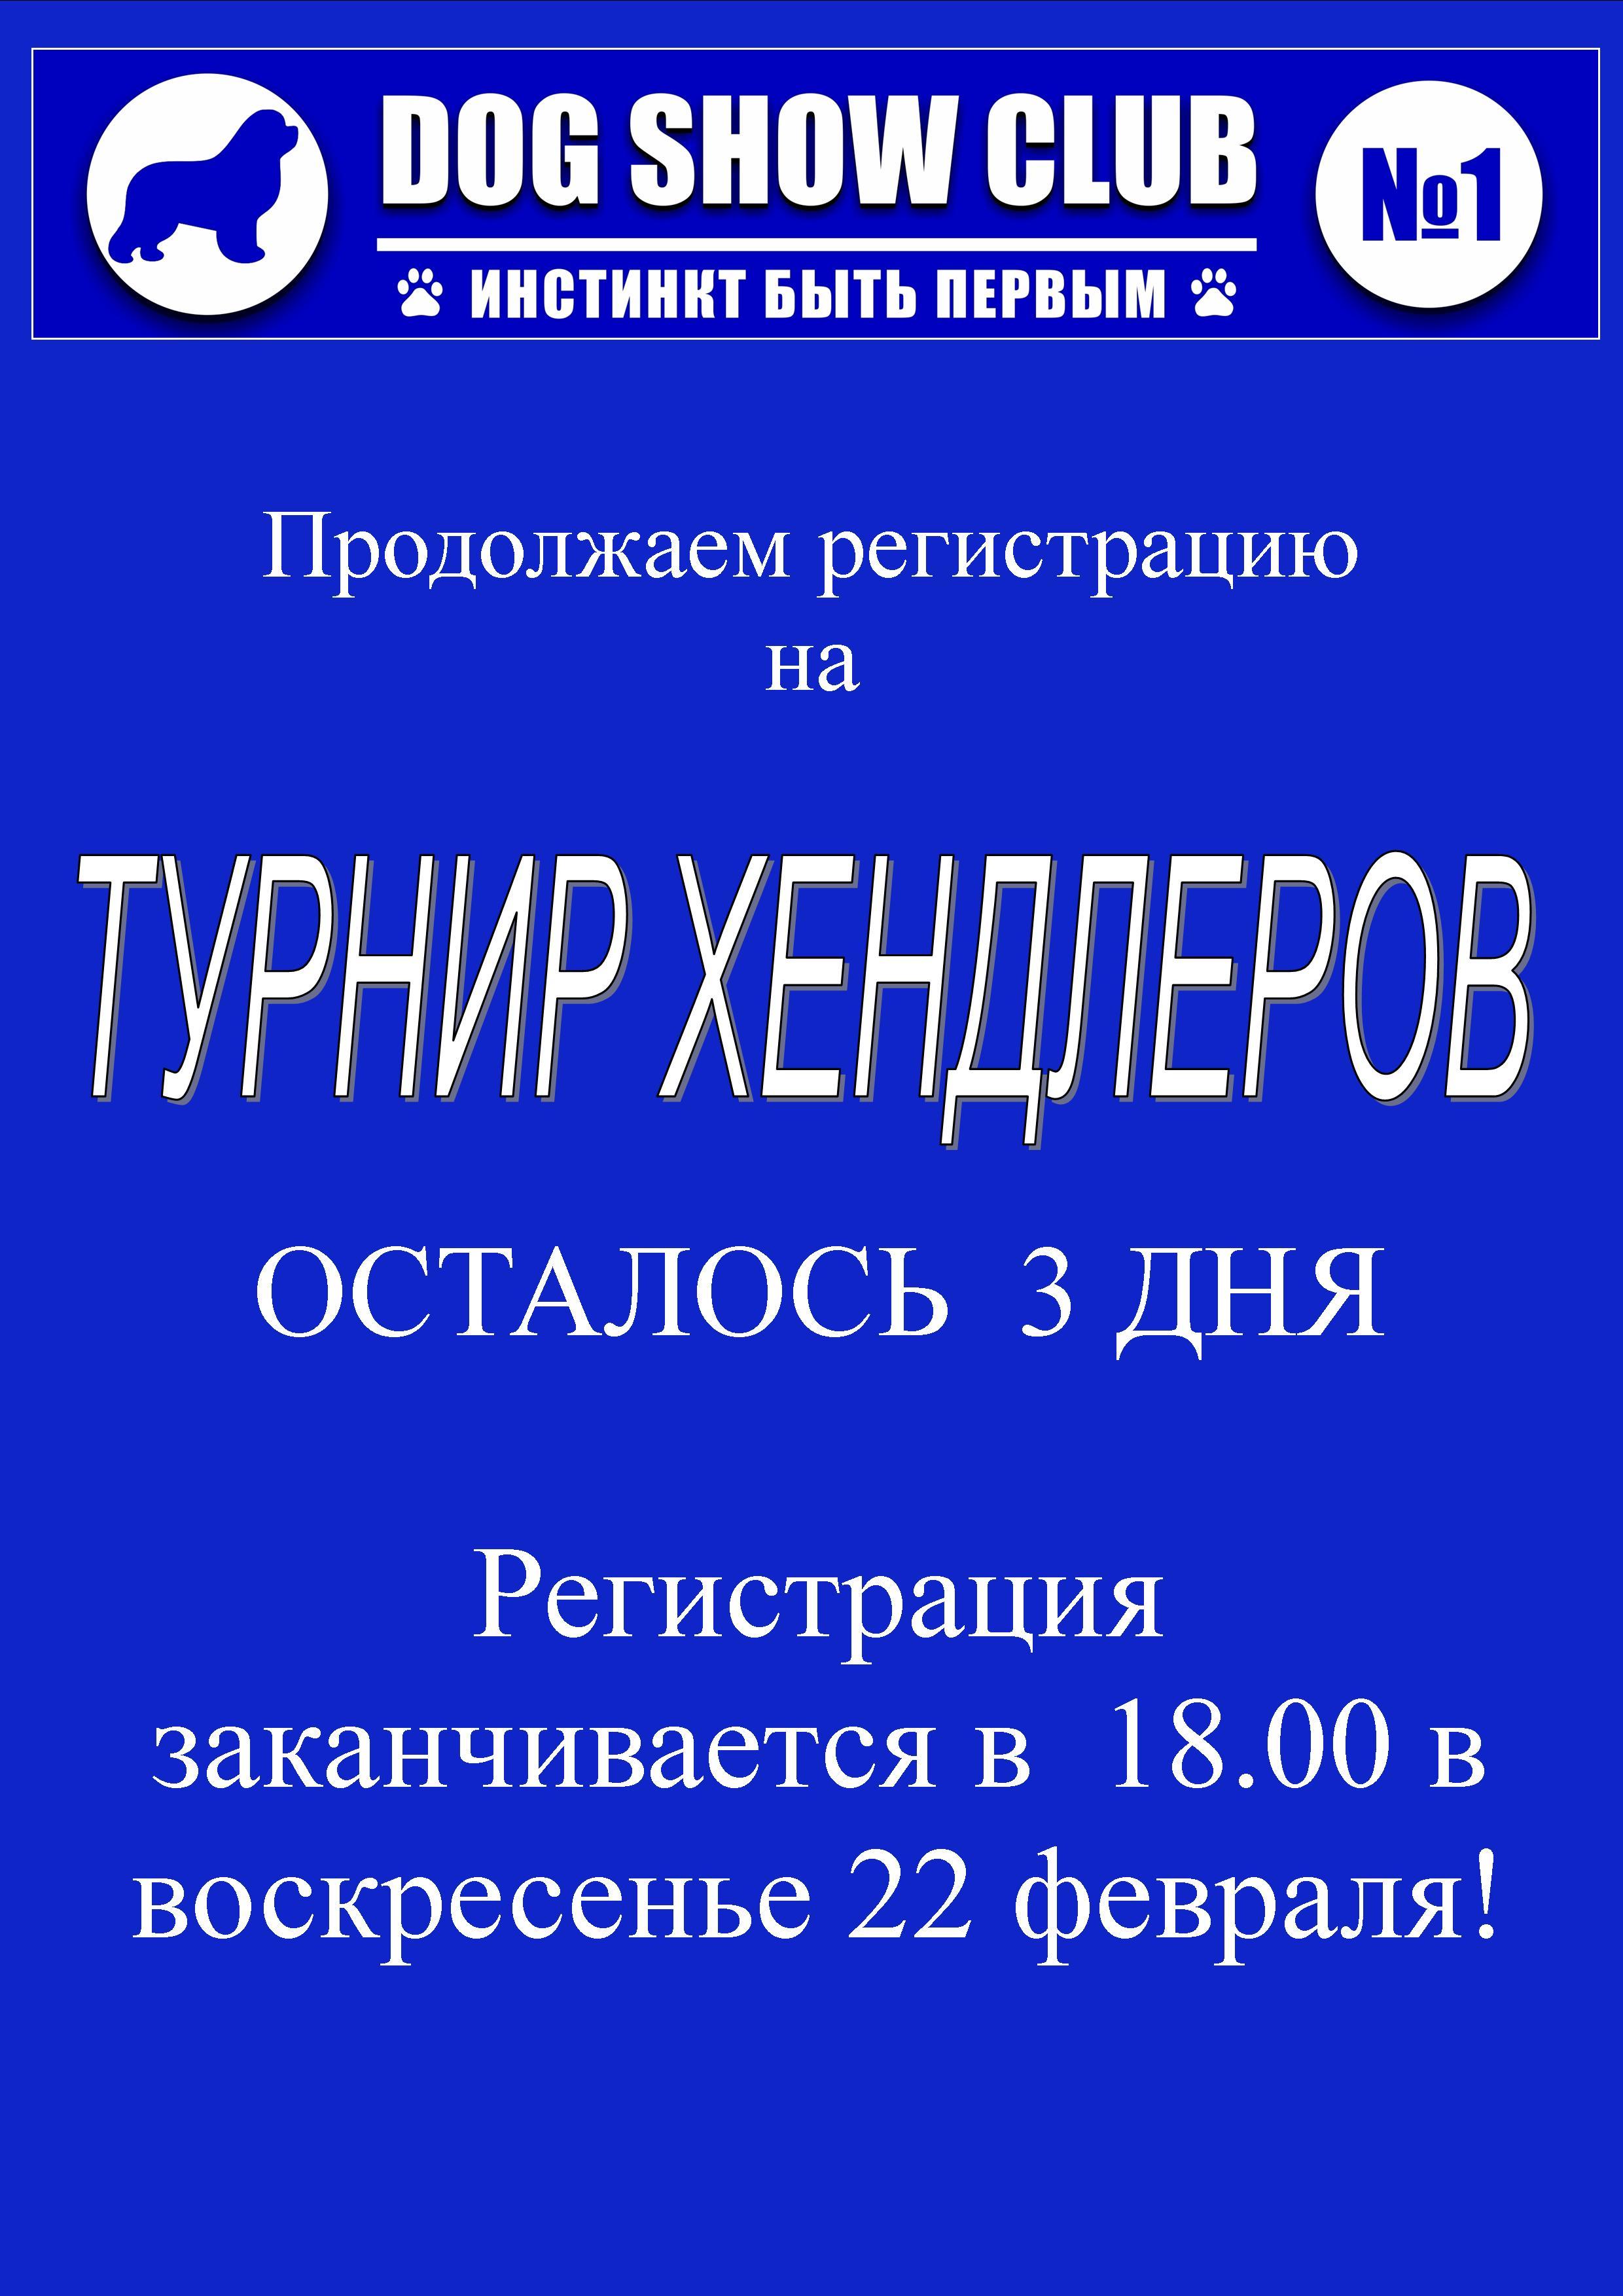 http://se.uploads.ru/hi8Nj.jpg